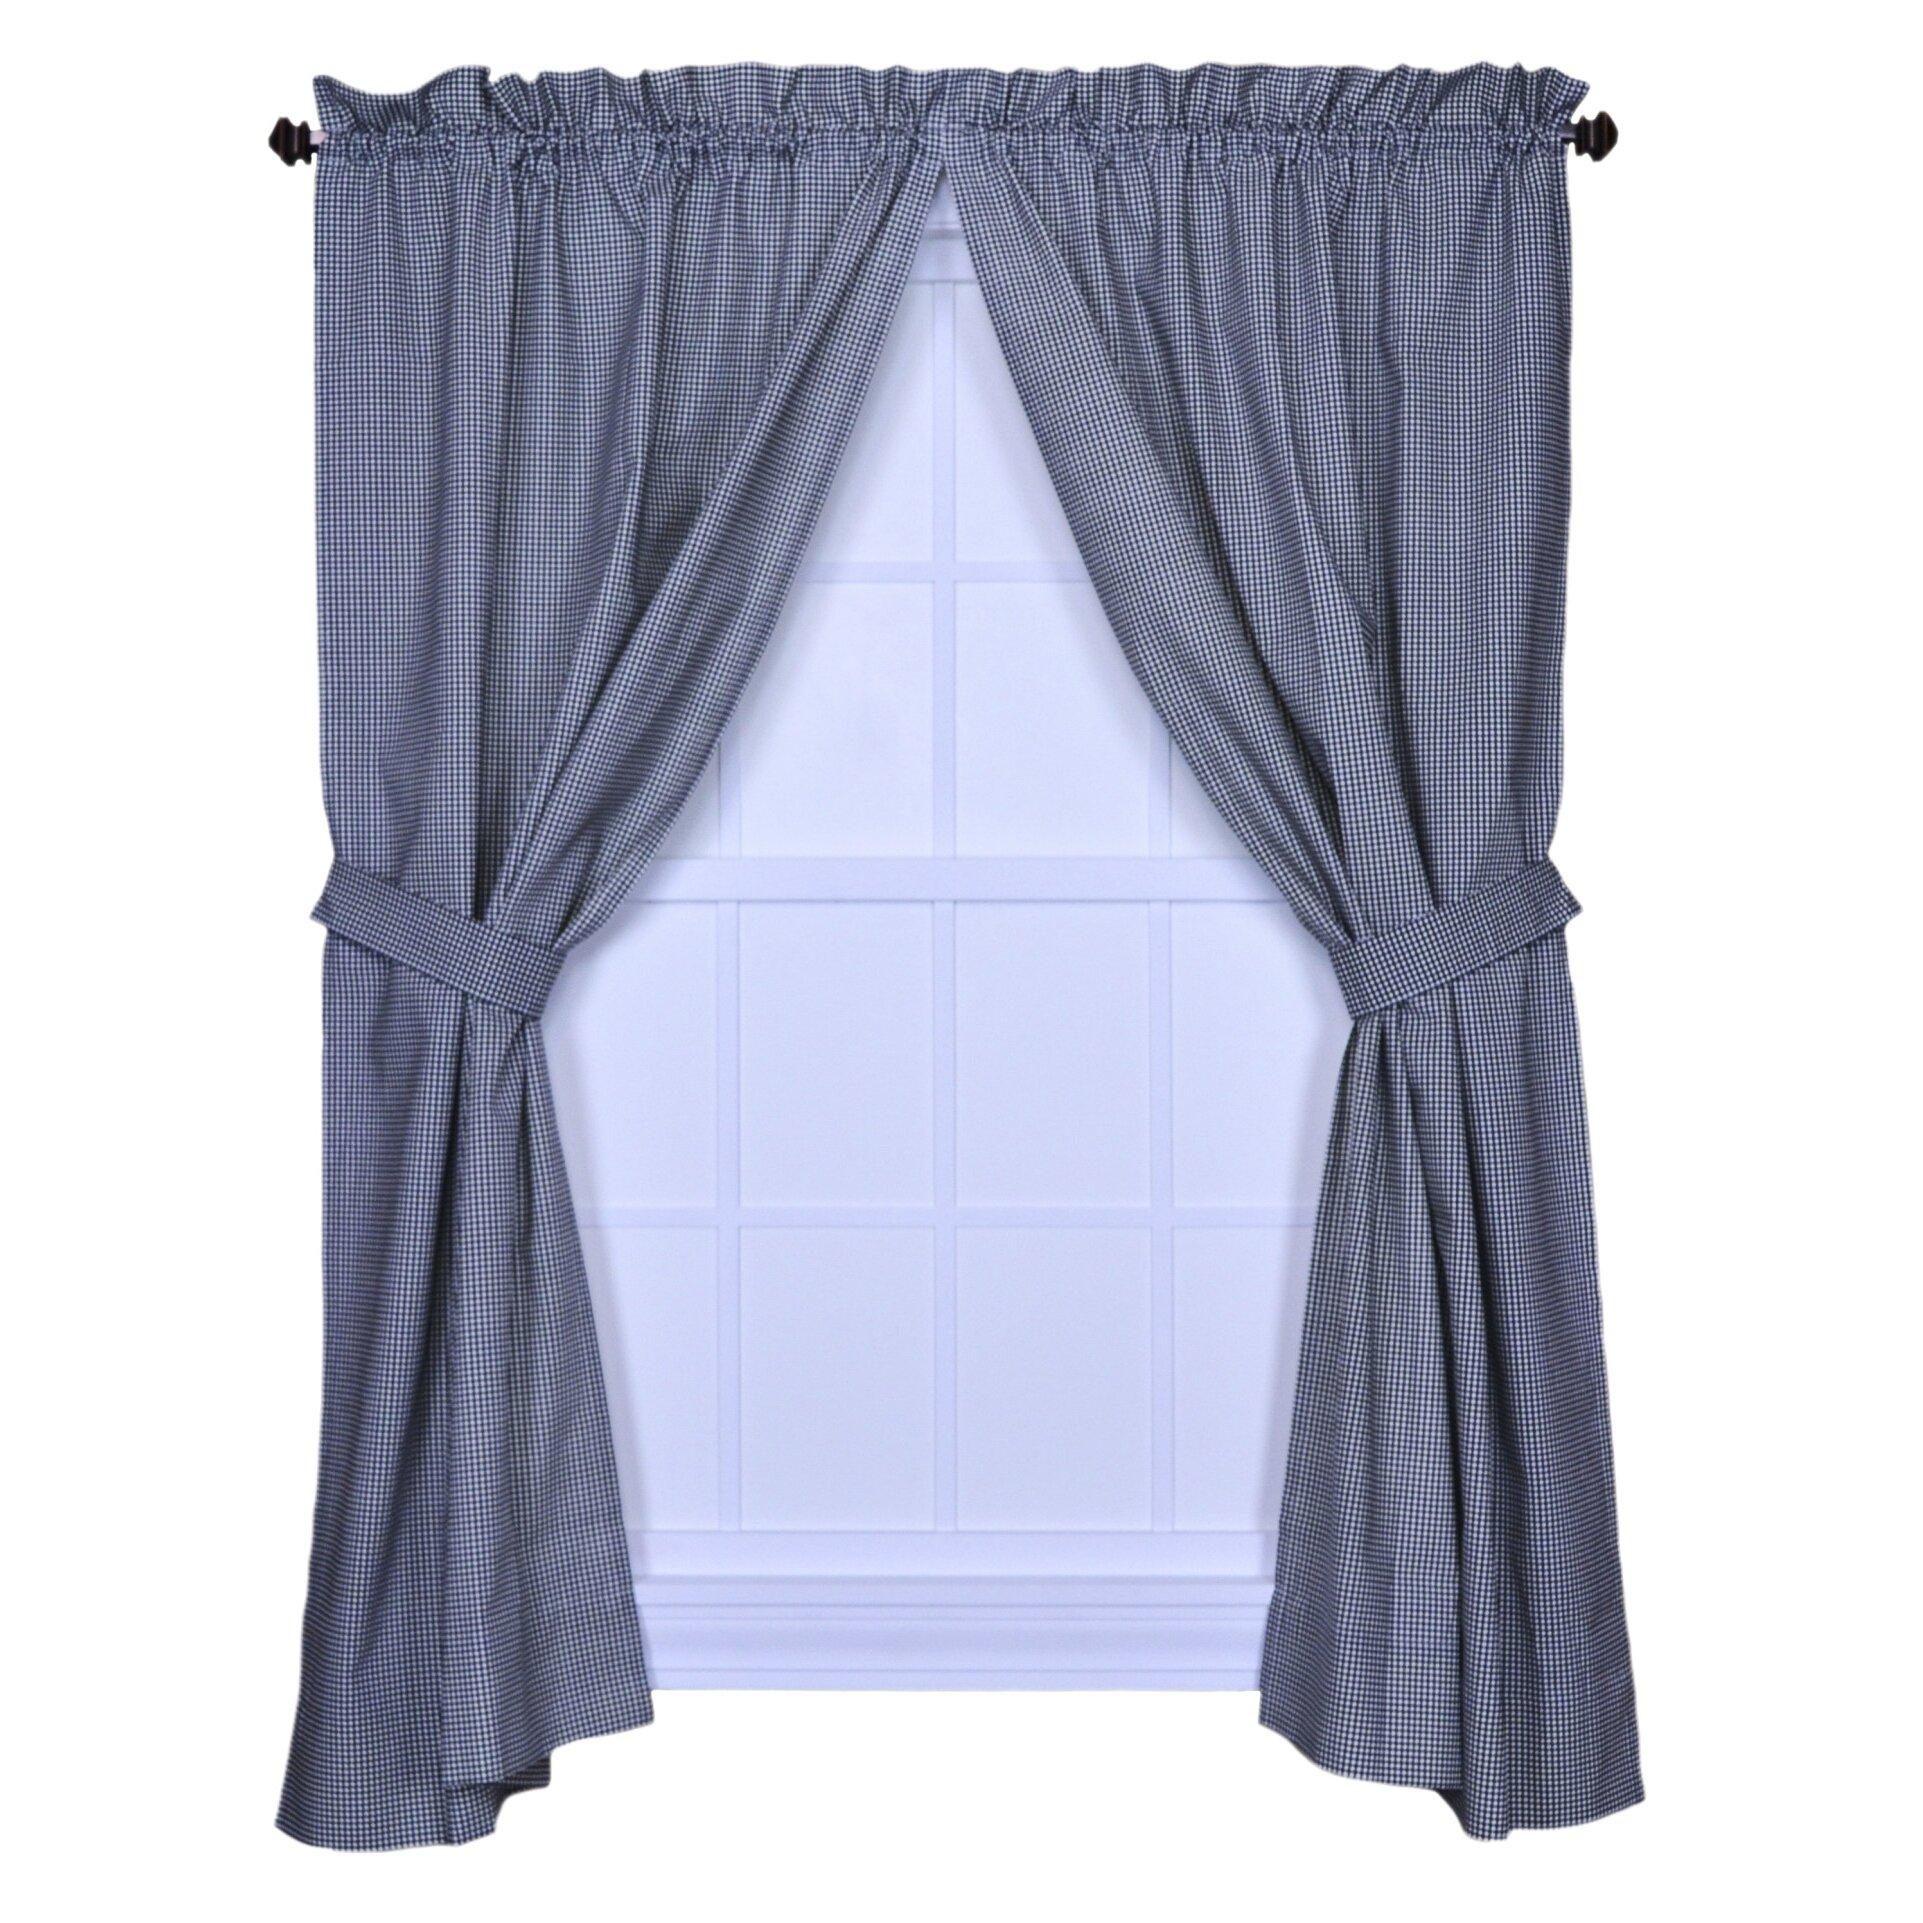 Ellis Curtain Logan Gingham Check Print Tailored Curtain Panels Reviews Wayfair